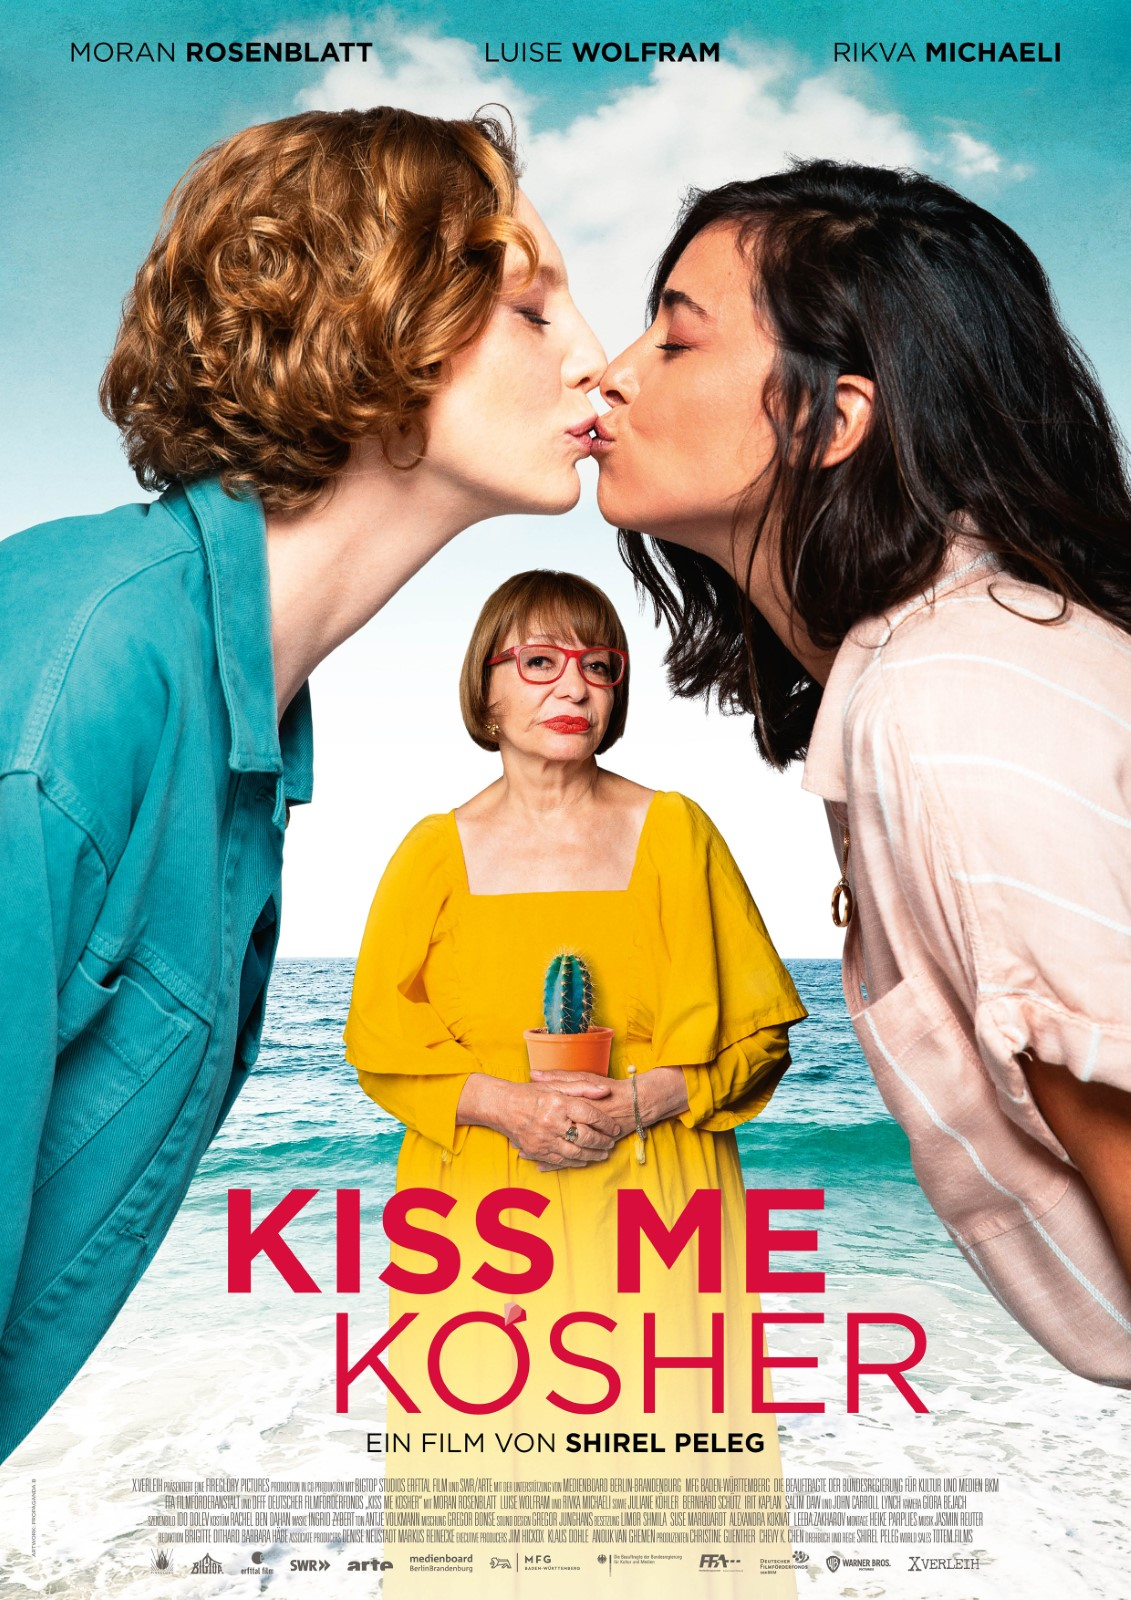 Kiss me kosher! - Film 2019 - FILMSTARTS.de